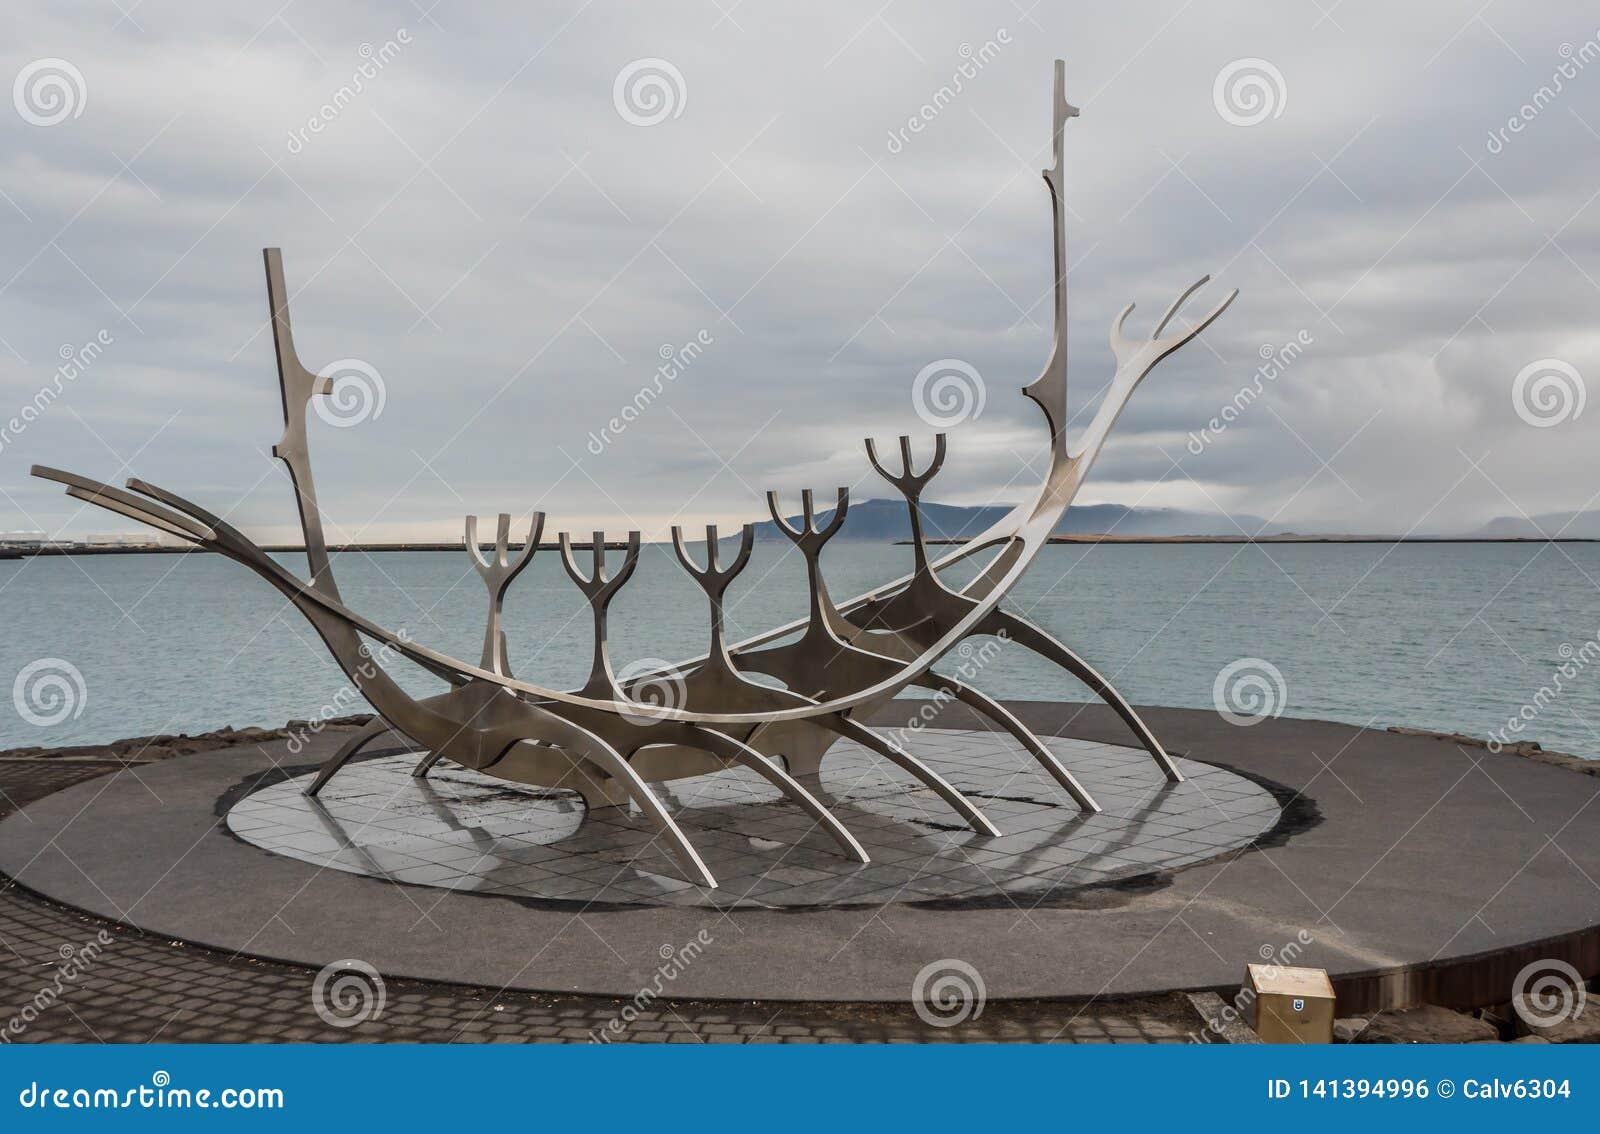 The Sun-Reisende-Skulptur onReykjavik Hafen in Reykjavik, Island